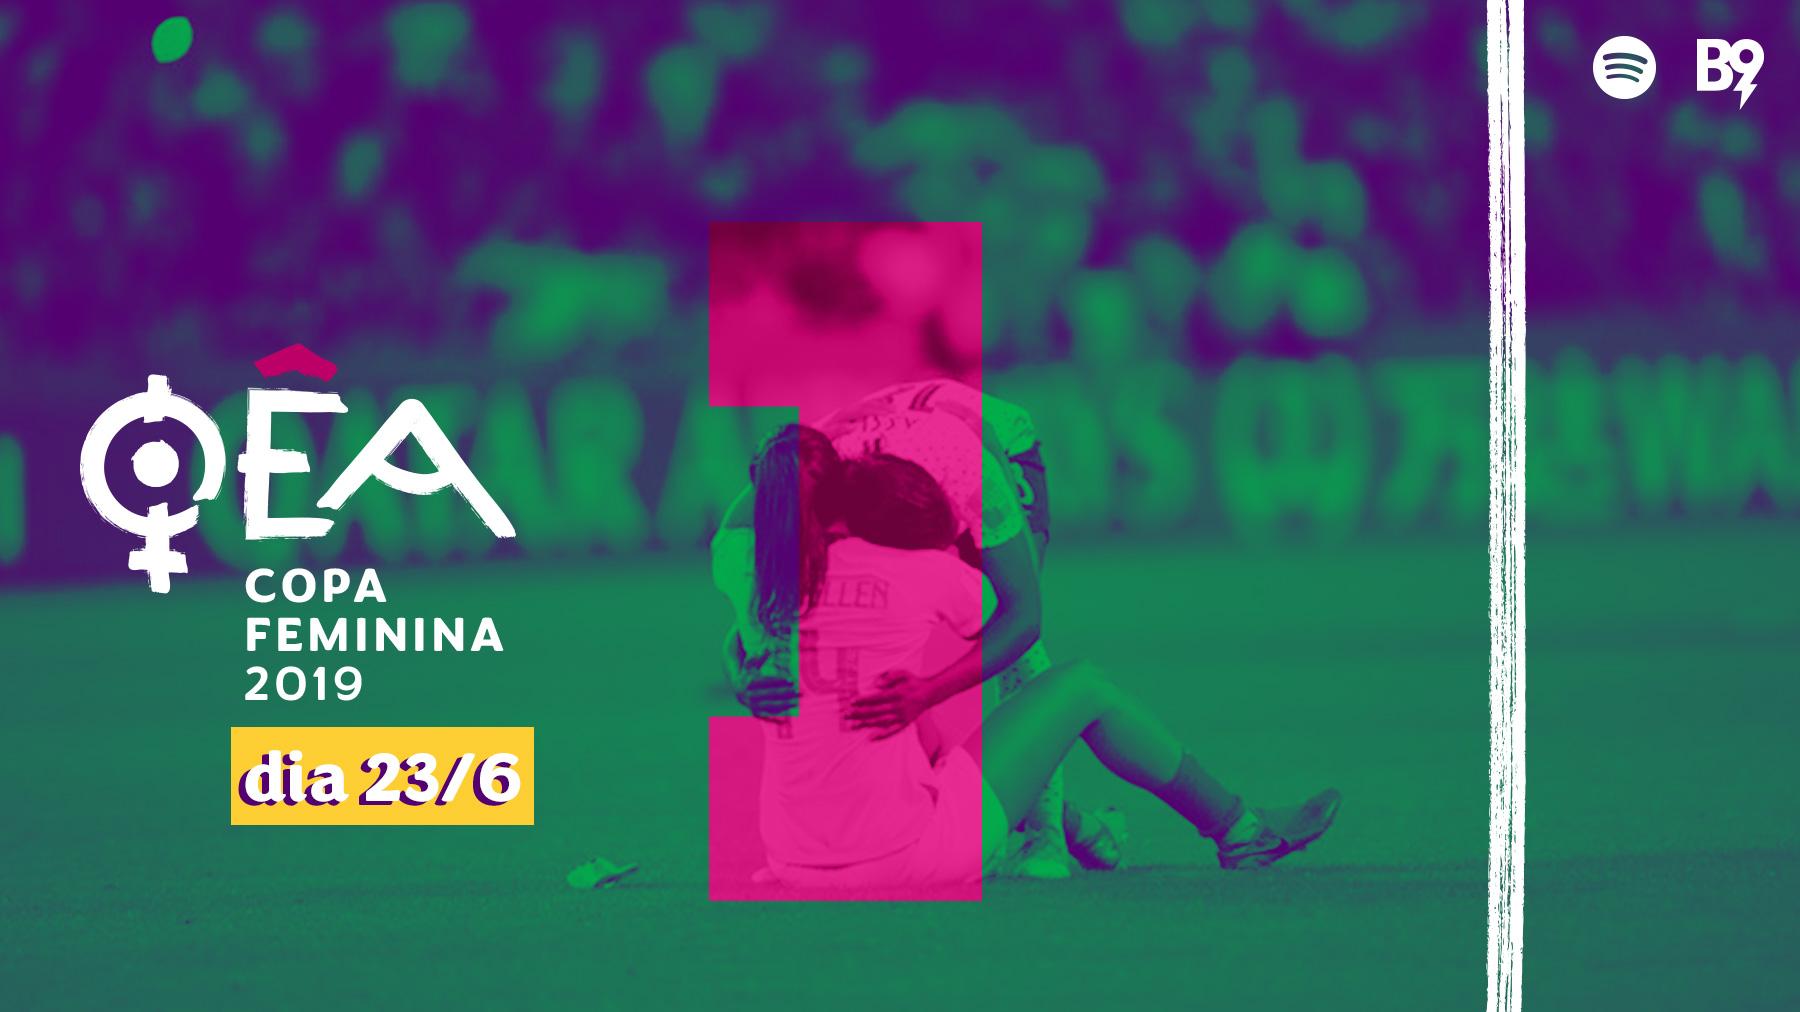 Oêa: Copa 2019 — 🏴 3-0 🇨🇲 / 🇫🇷 2-1 🇧🇷